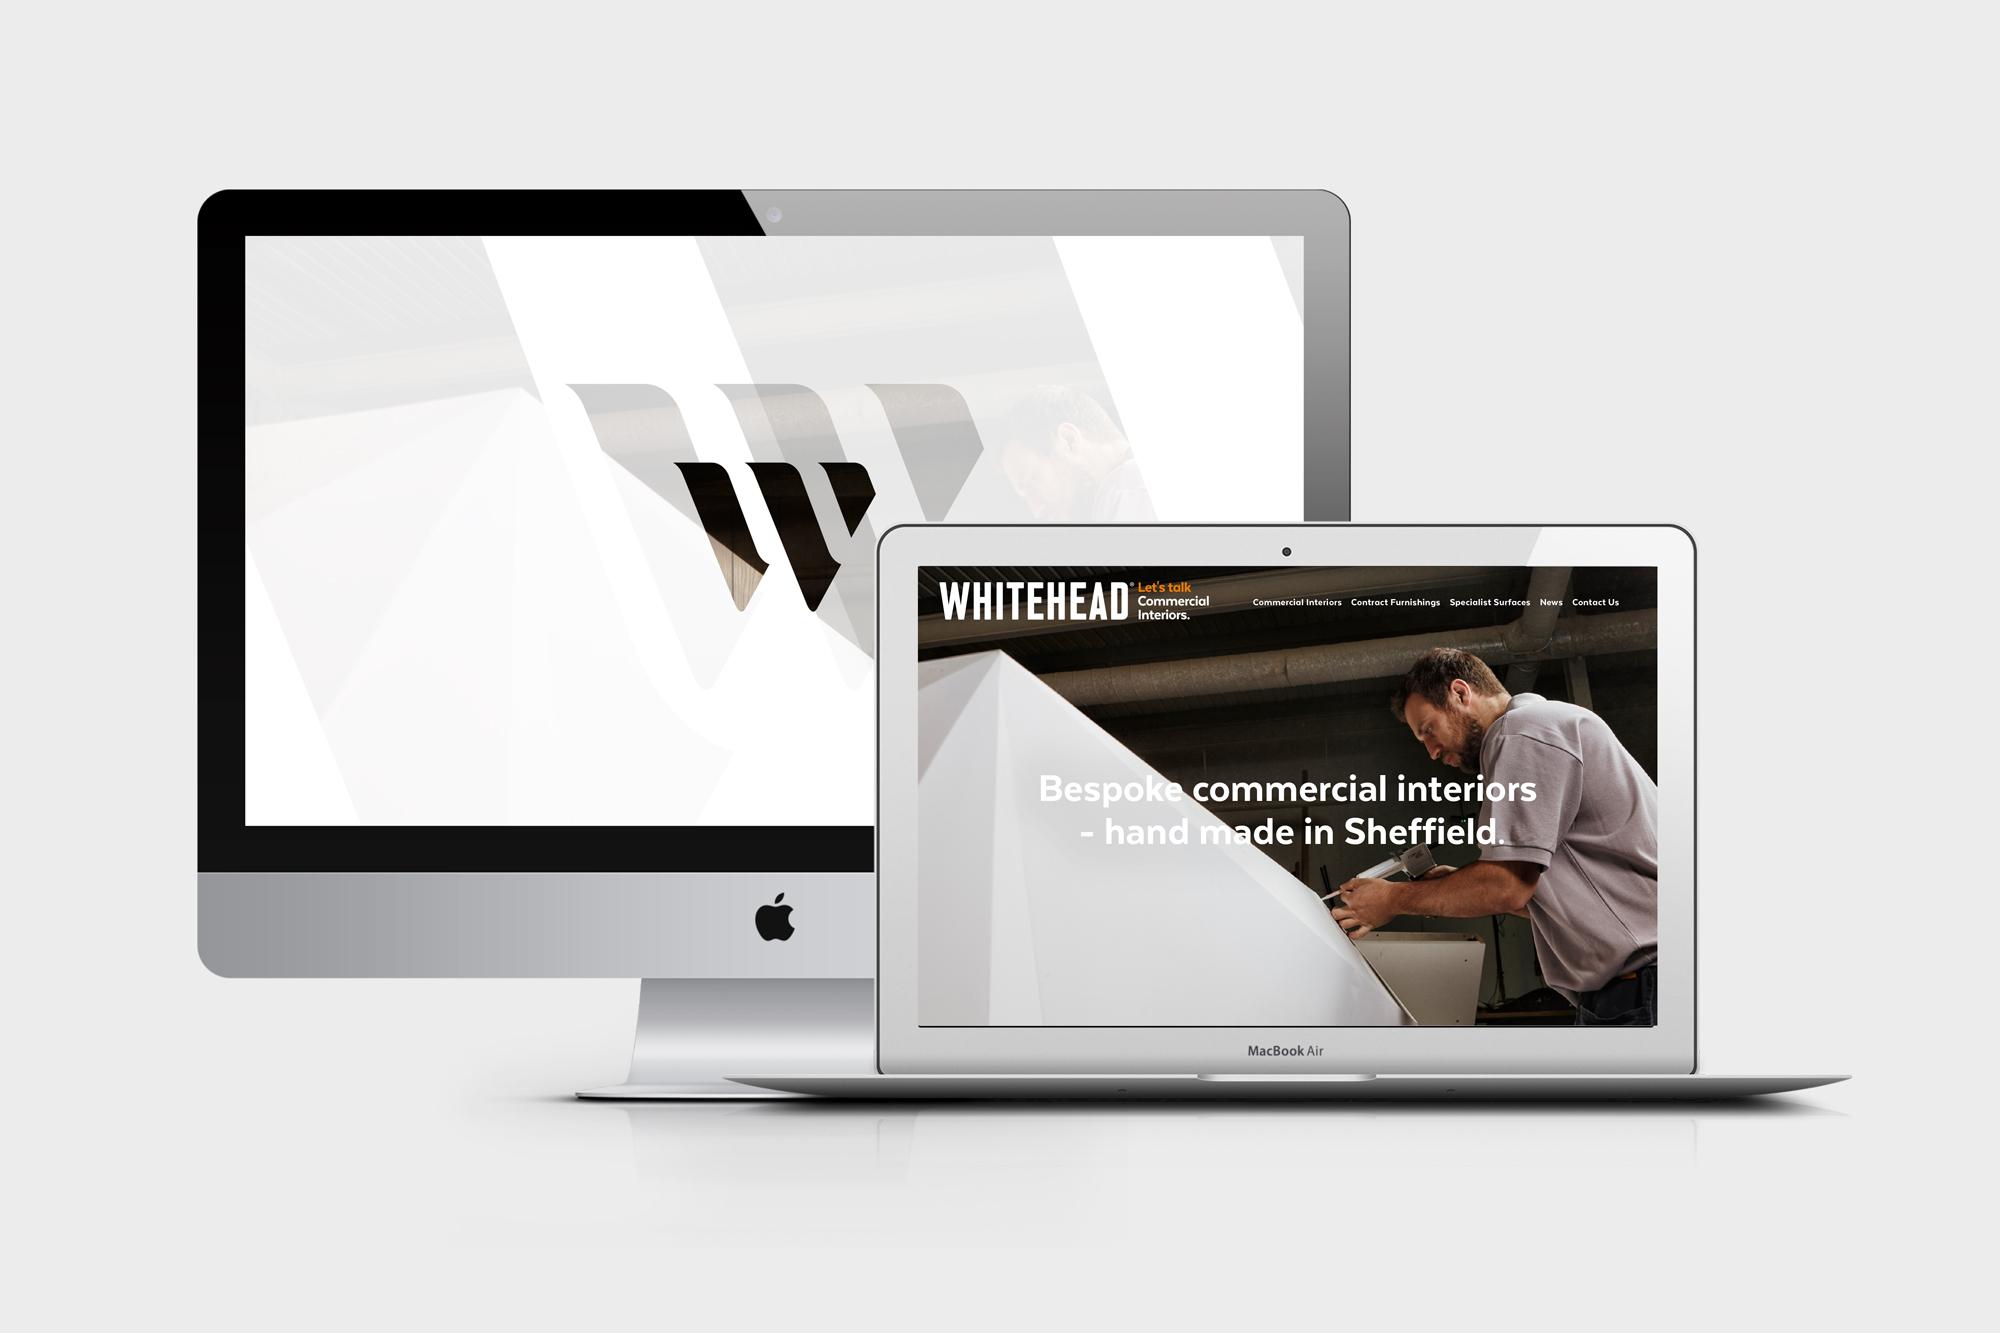 whitehead-rebrand-web.jpg